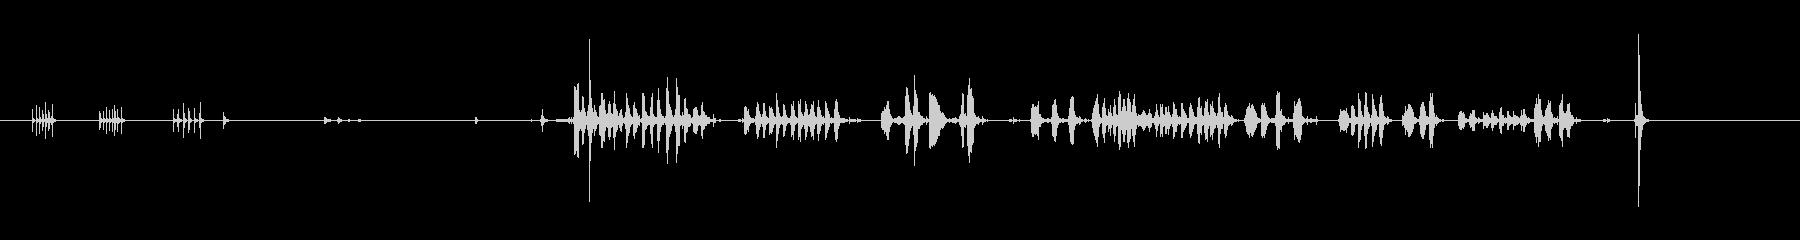 MUSIC BOX、WIND UP...の未再生の波形